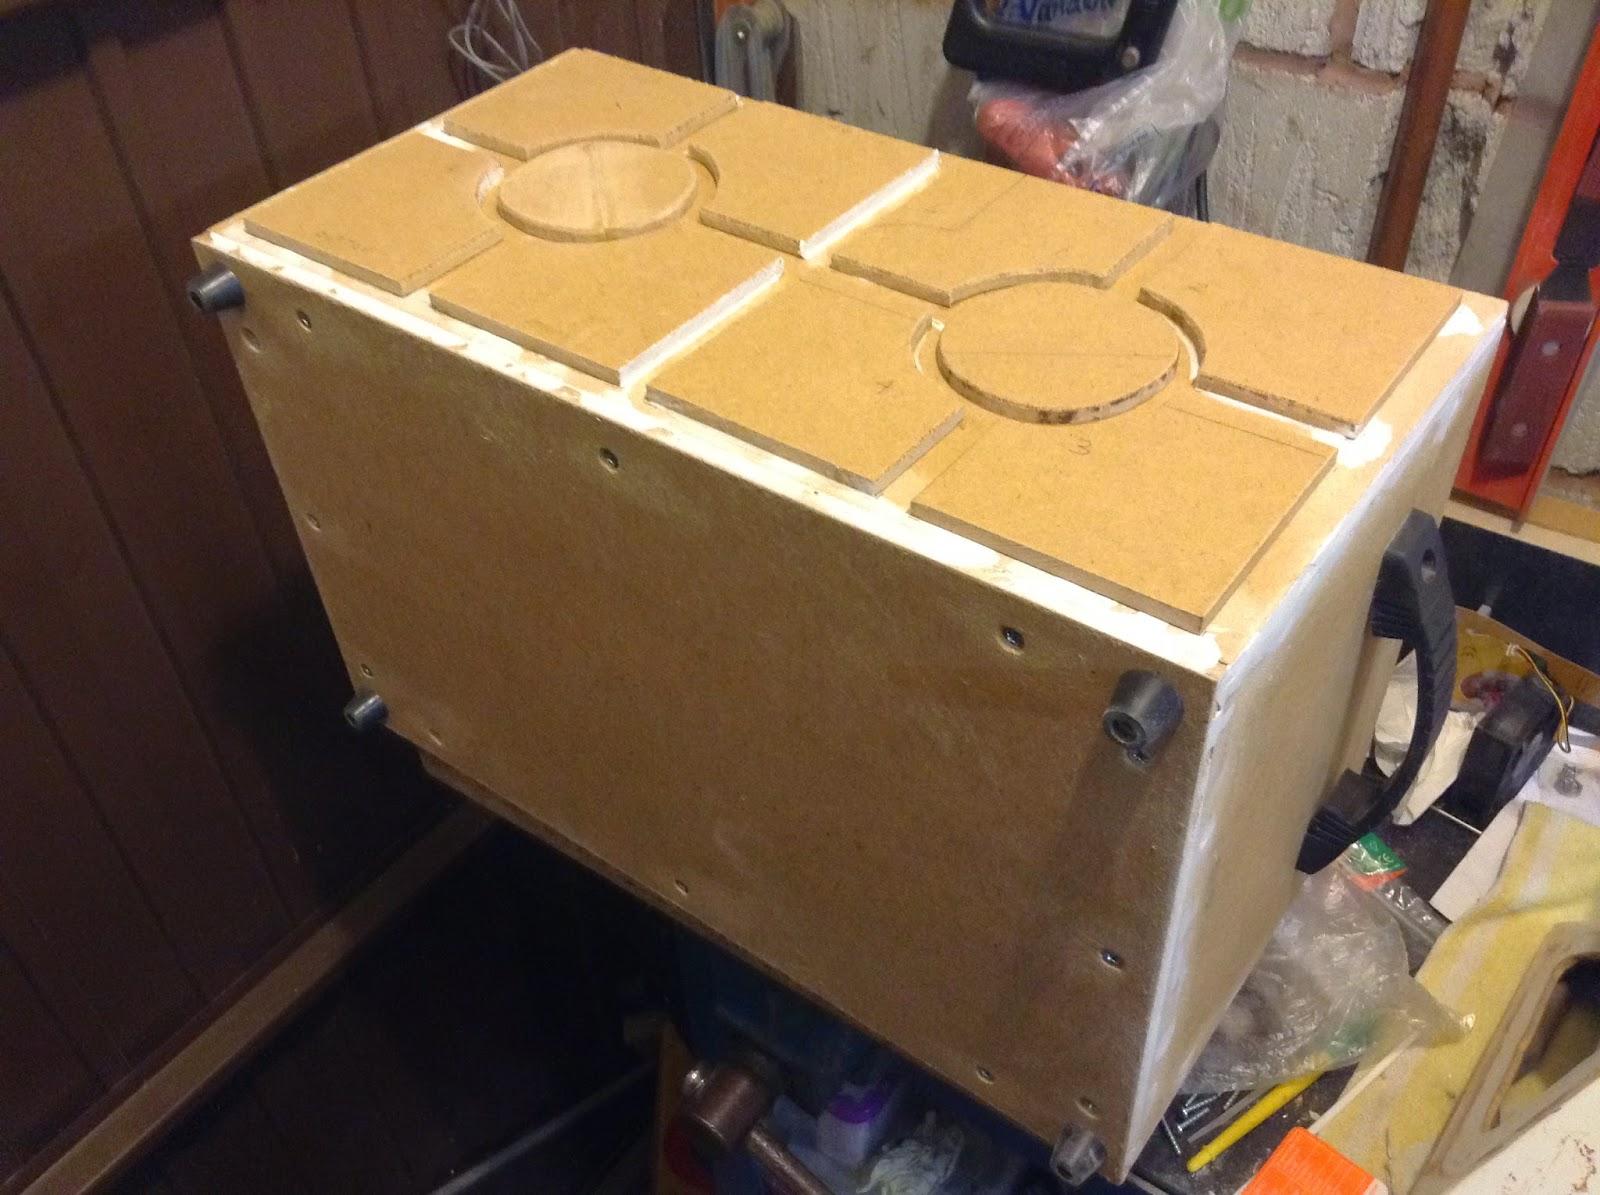 Scanning crew container prop